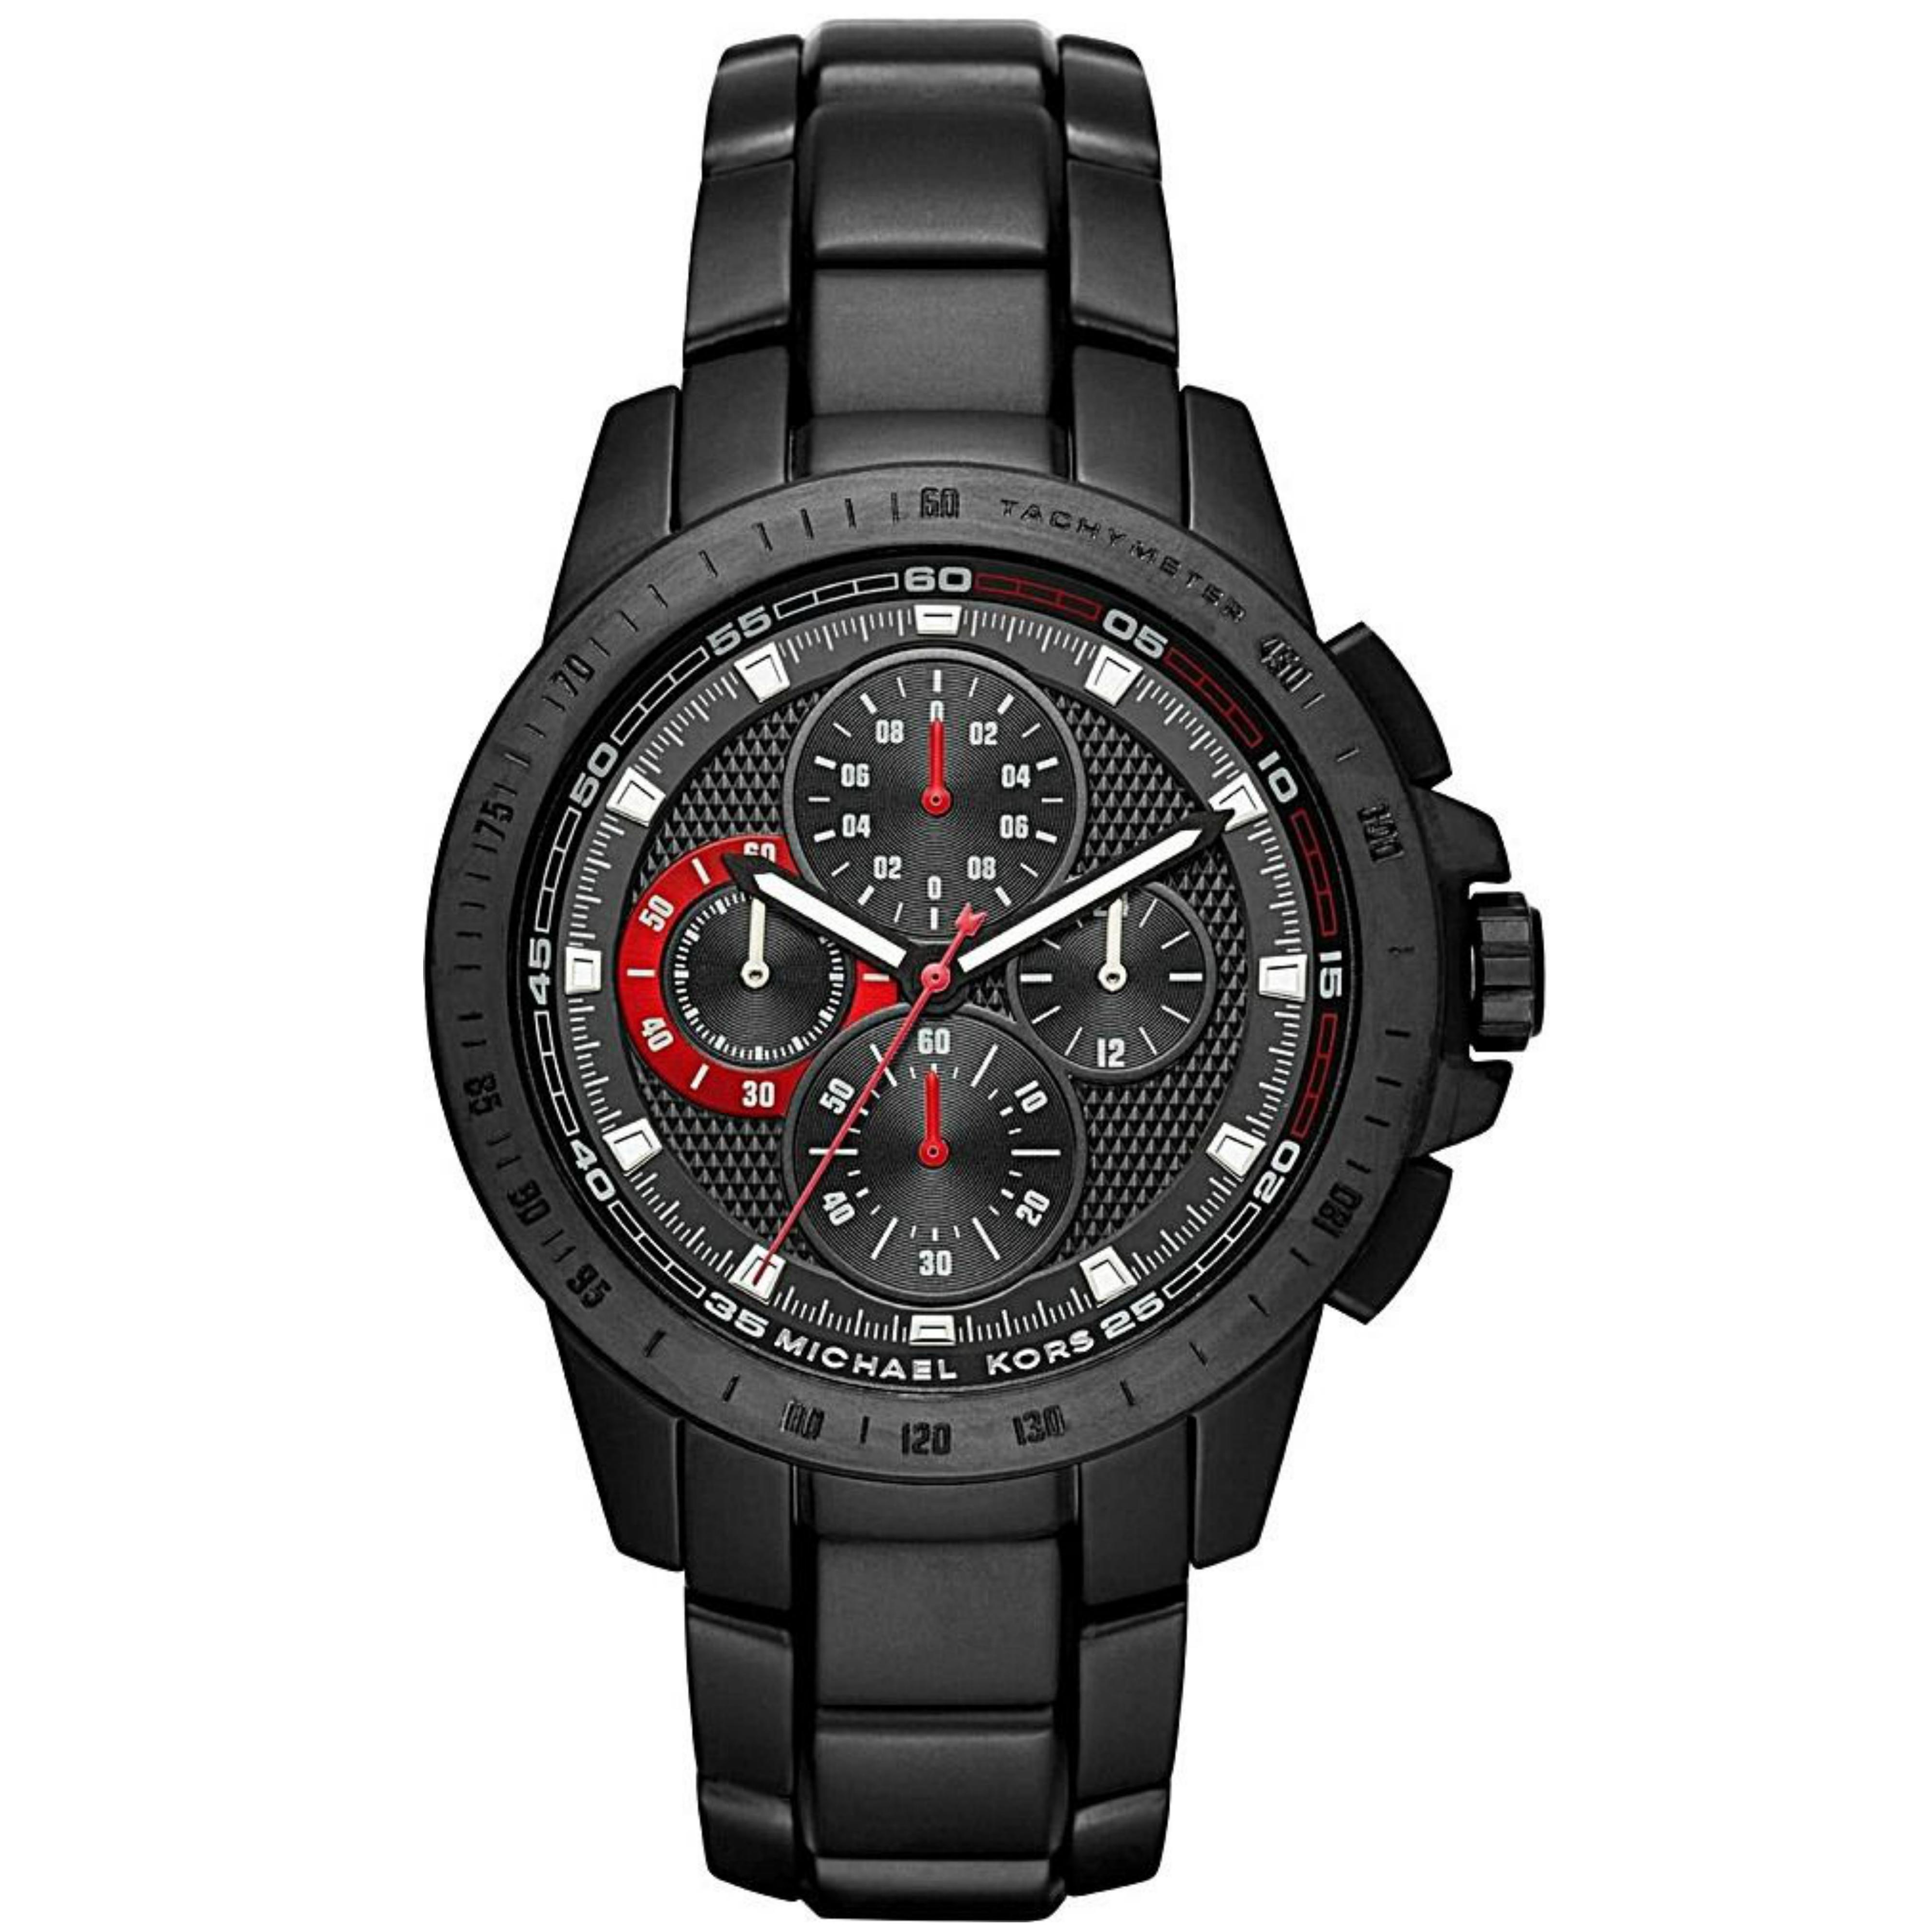 Michael Kors Ryker Men's Black Dial Chronograph Round Analog Wrist Watch MK8529